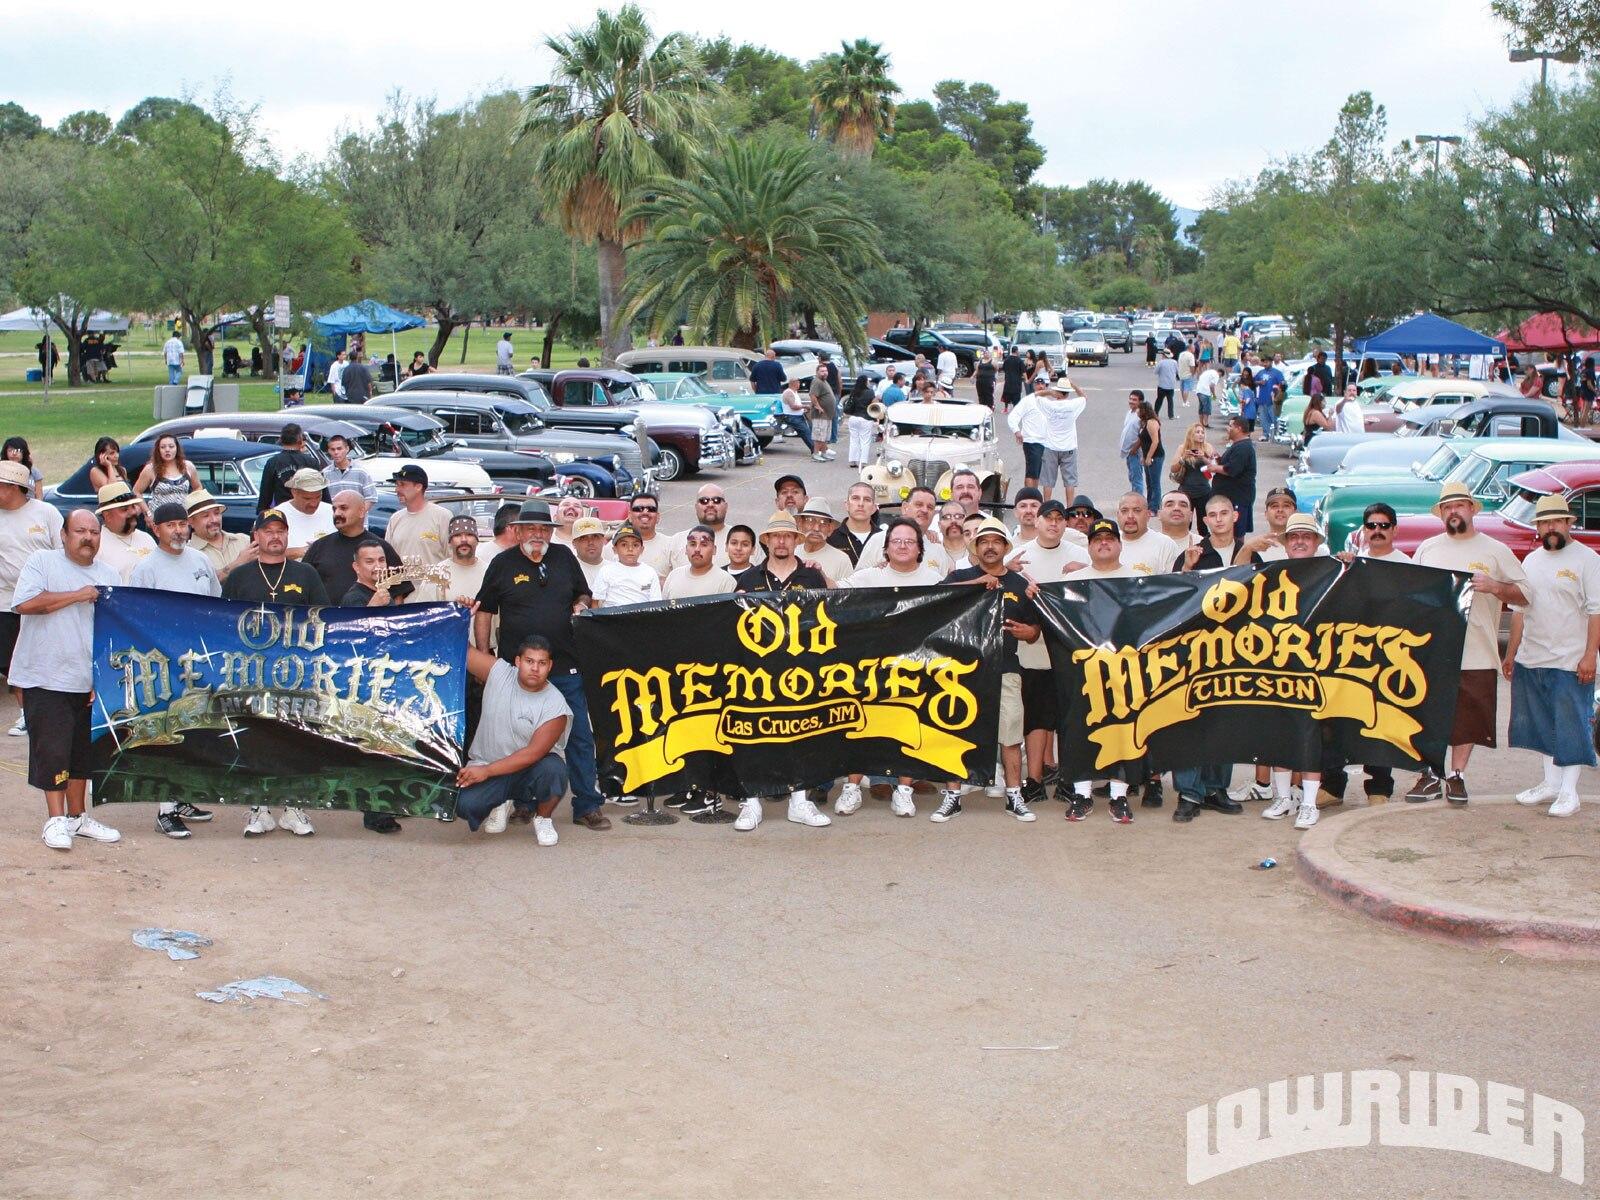 lrmp_1104_25_o-old_memories_cc-banners3